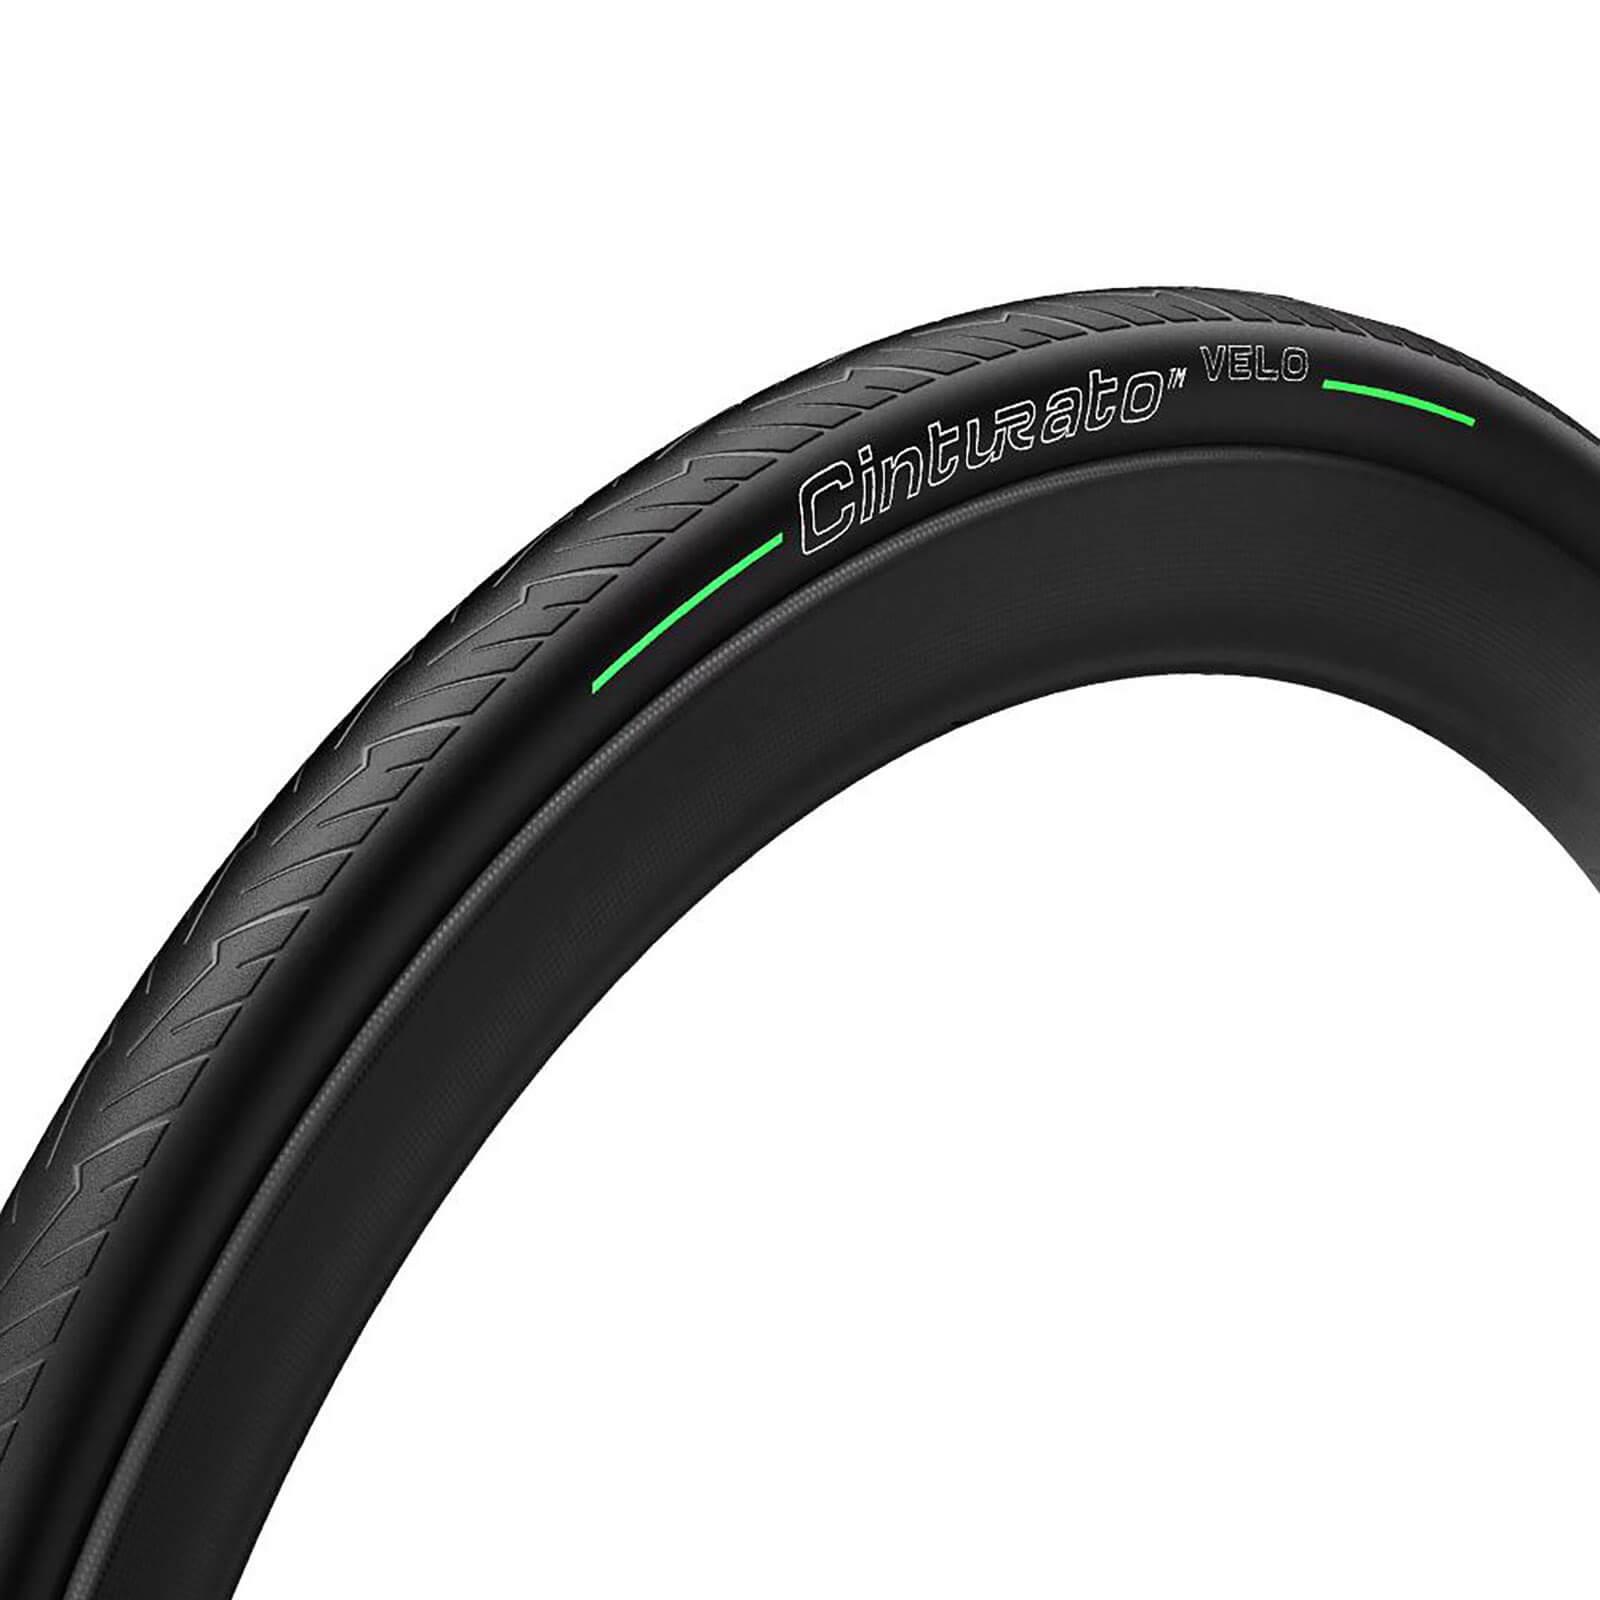 Pirelli Cinturato Velo チューブレスレディ・フォールディング・ロードタイヤ